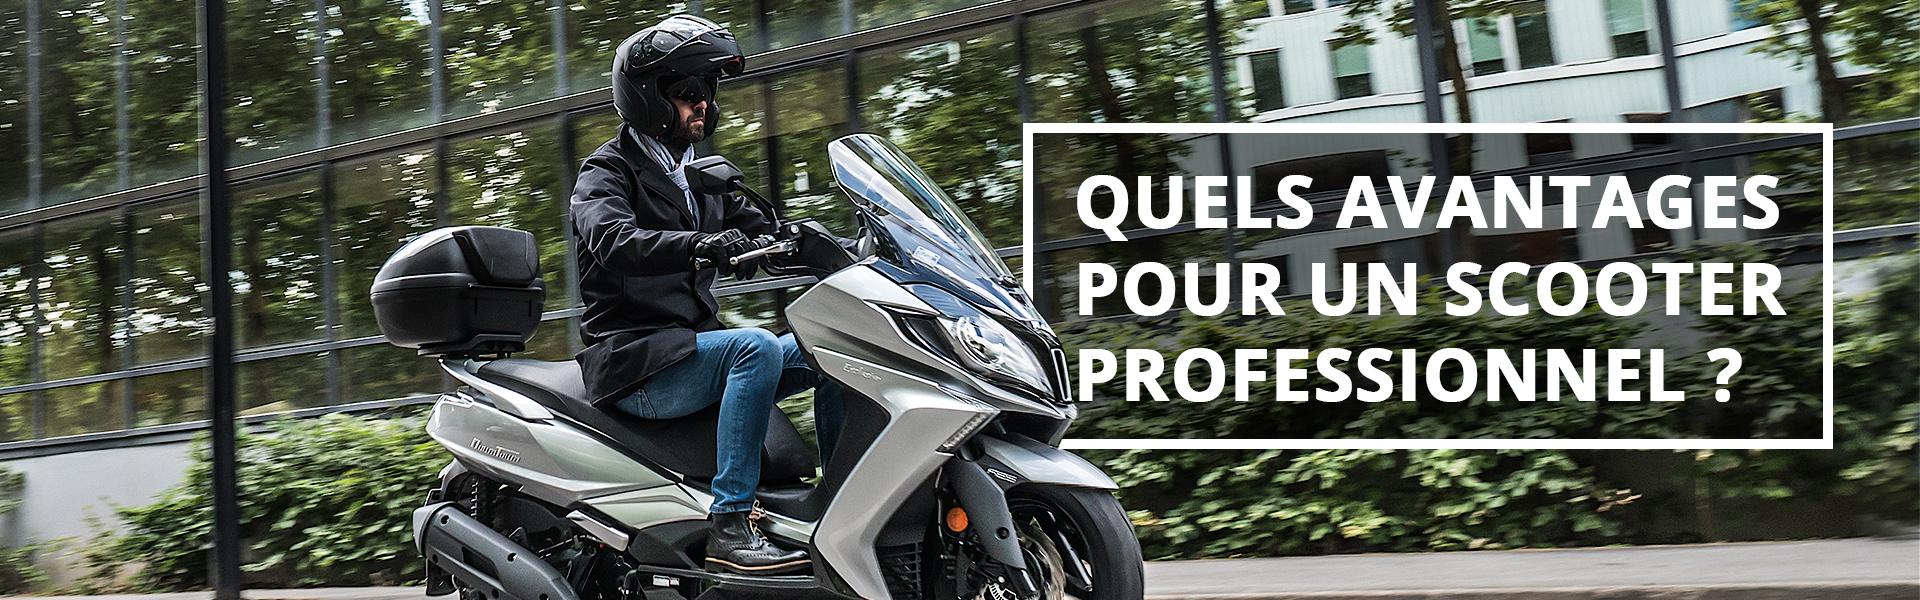 avantages-scooter-pro